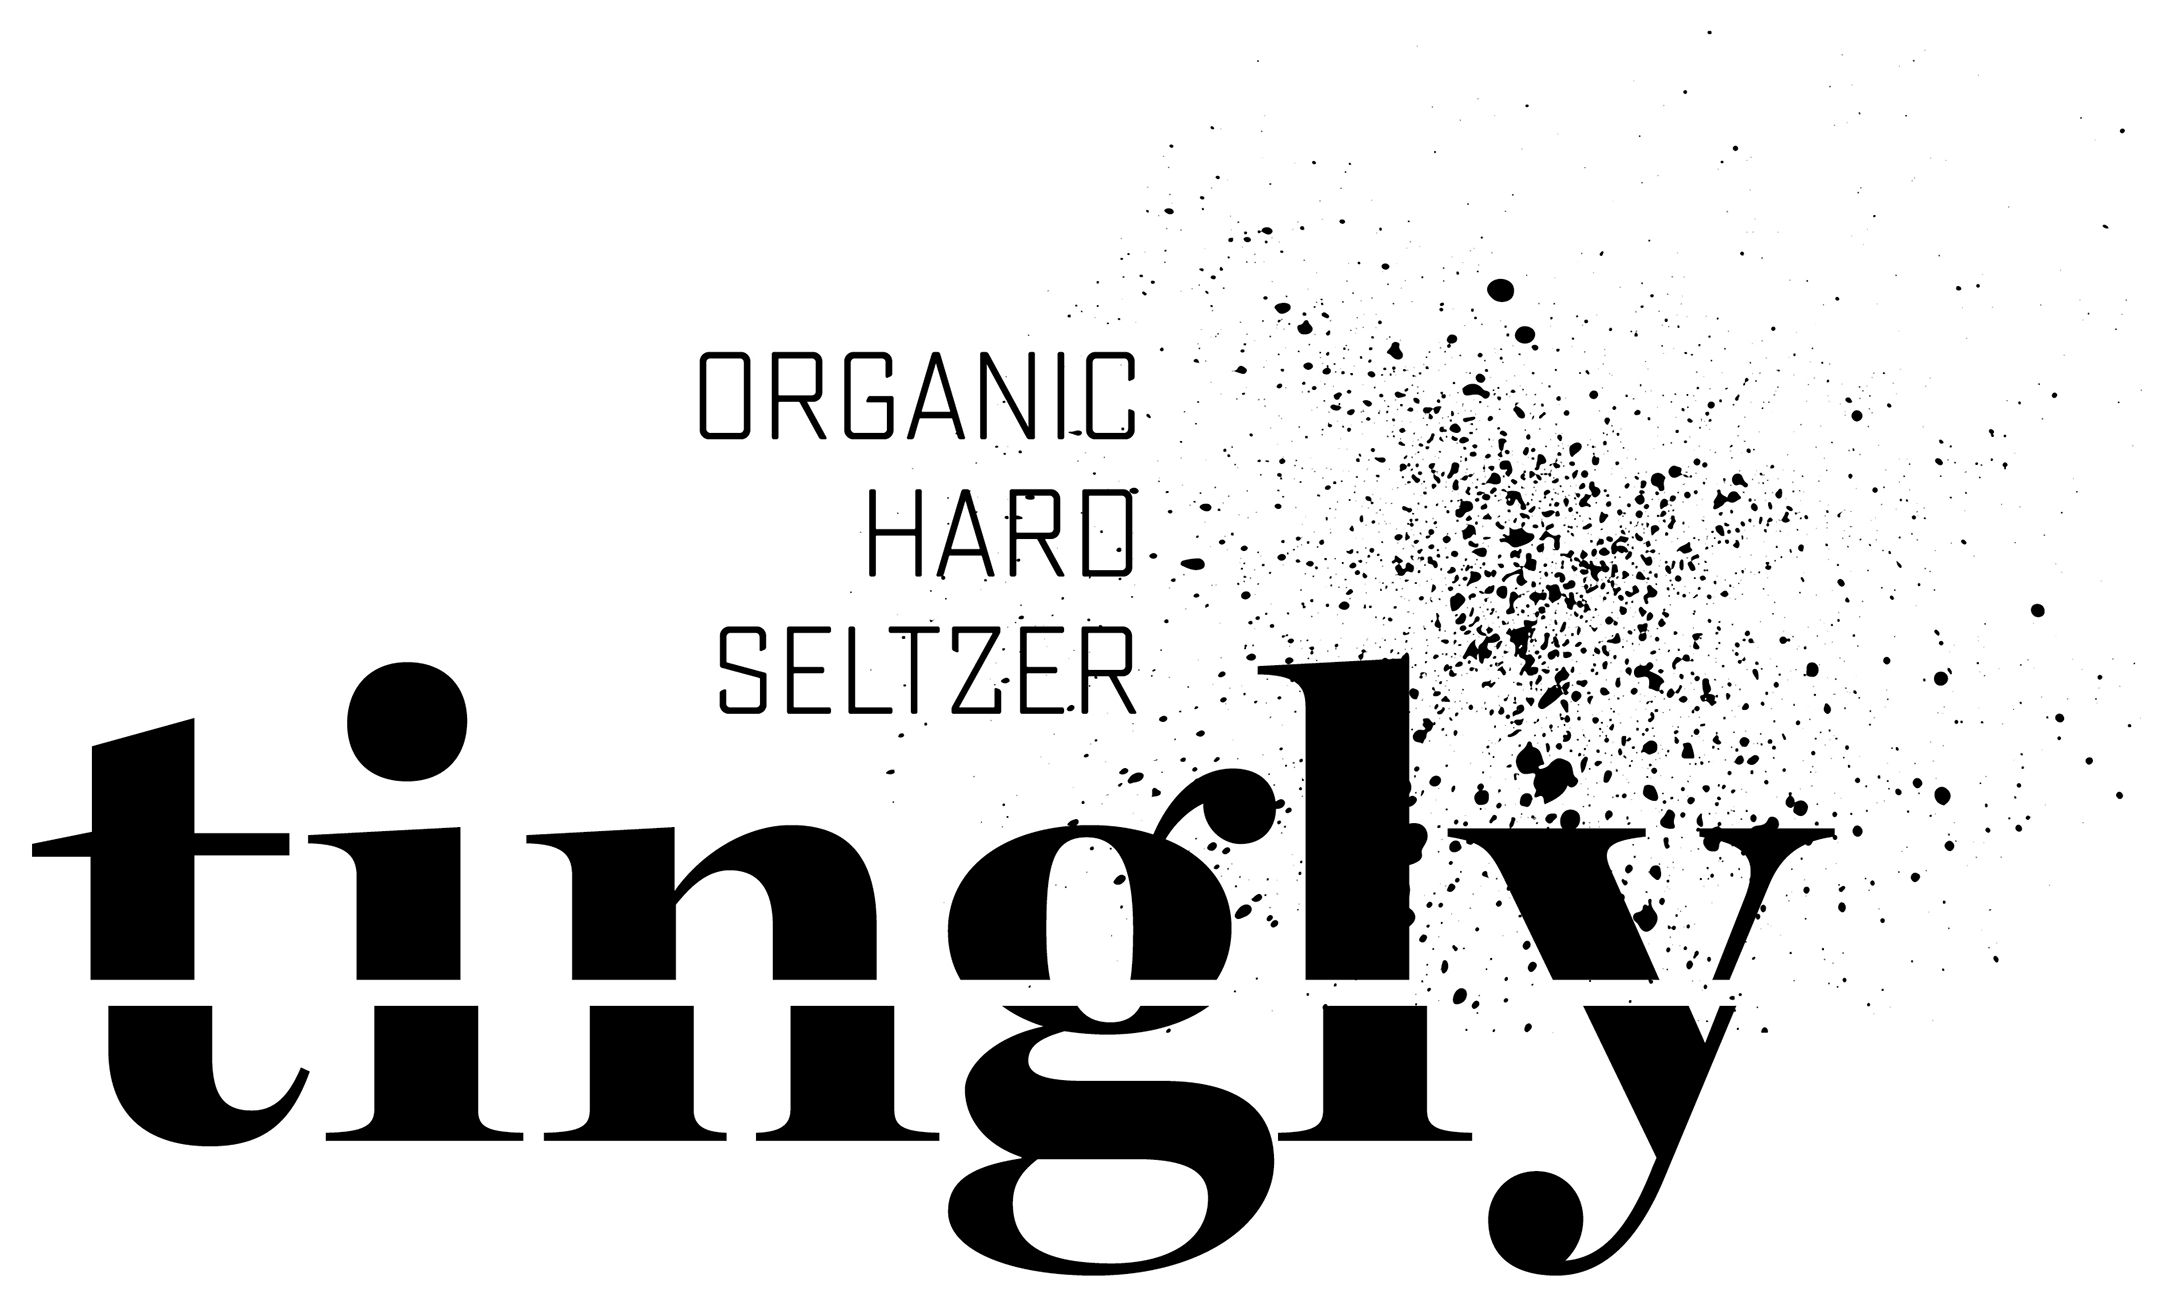 Wort-/Bildmarke: ORGANIC HARD SELTZER tingly